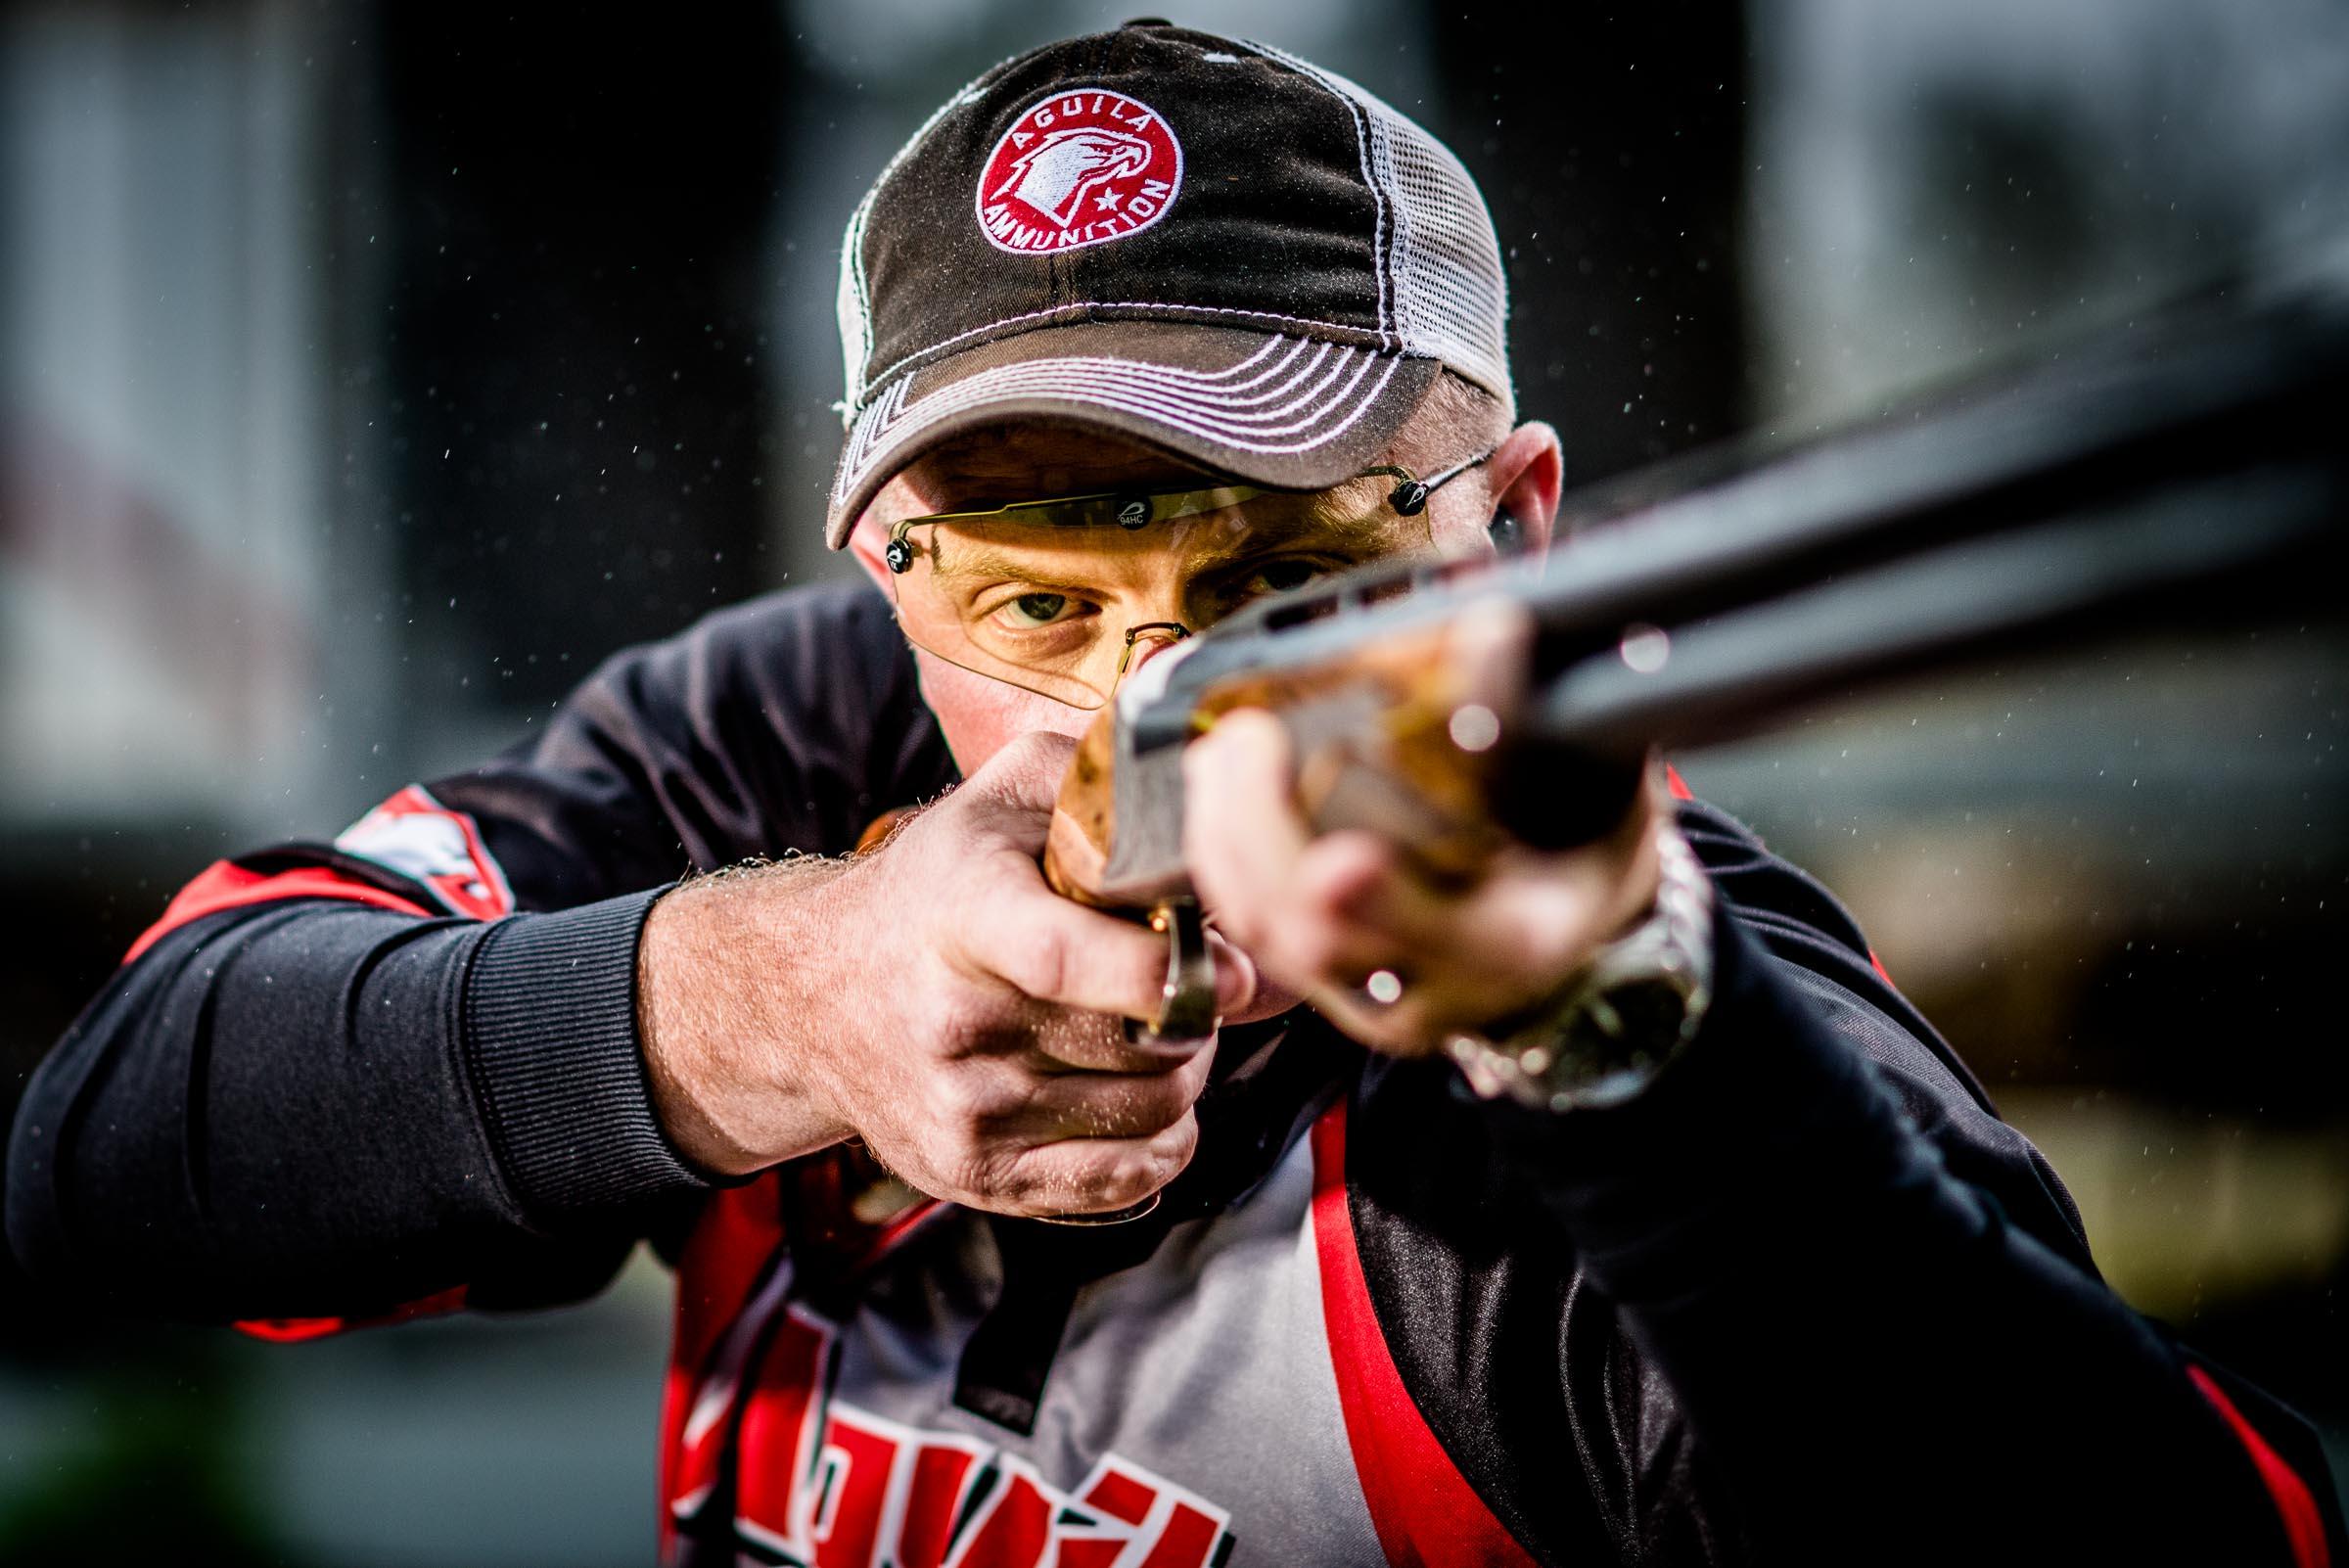 Aguila Ammunition professional shotgun shooter. © Tony Bynum